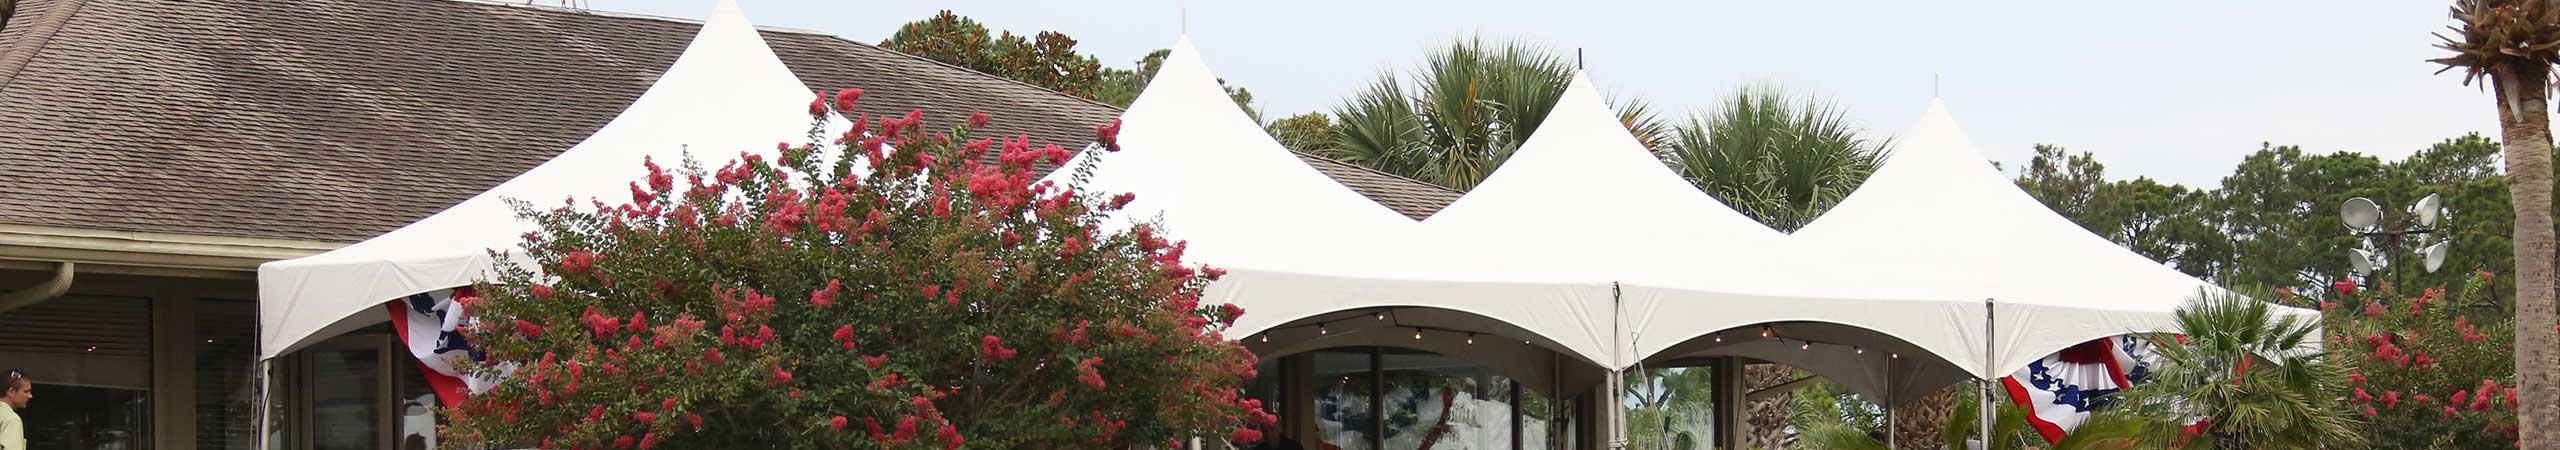 Jacksonville, FL Tent Rentals